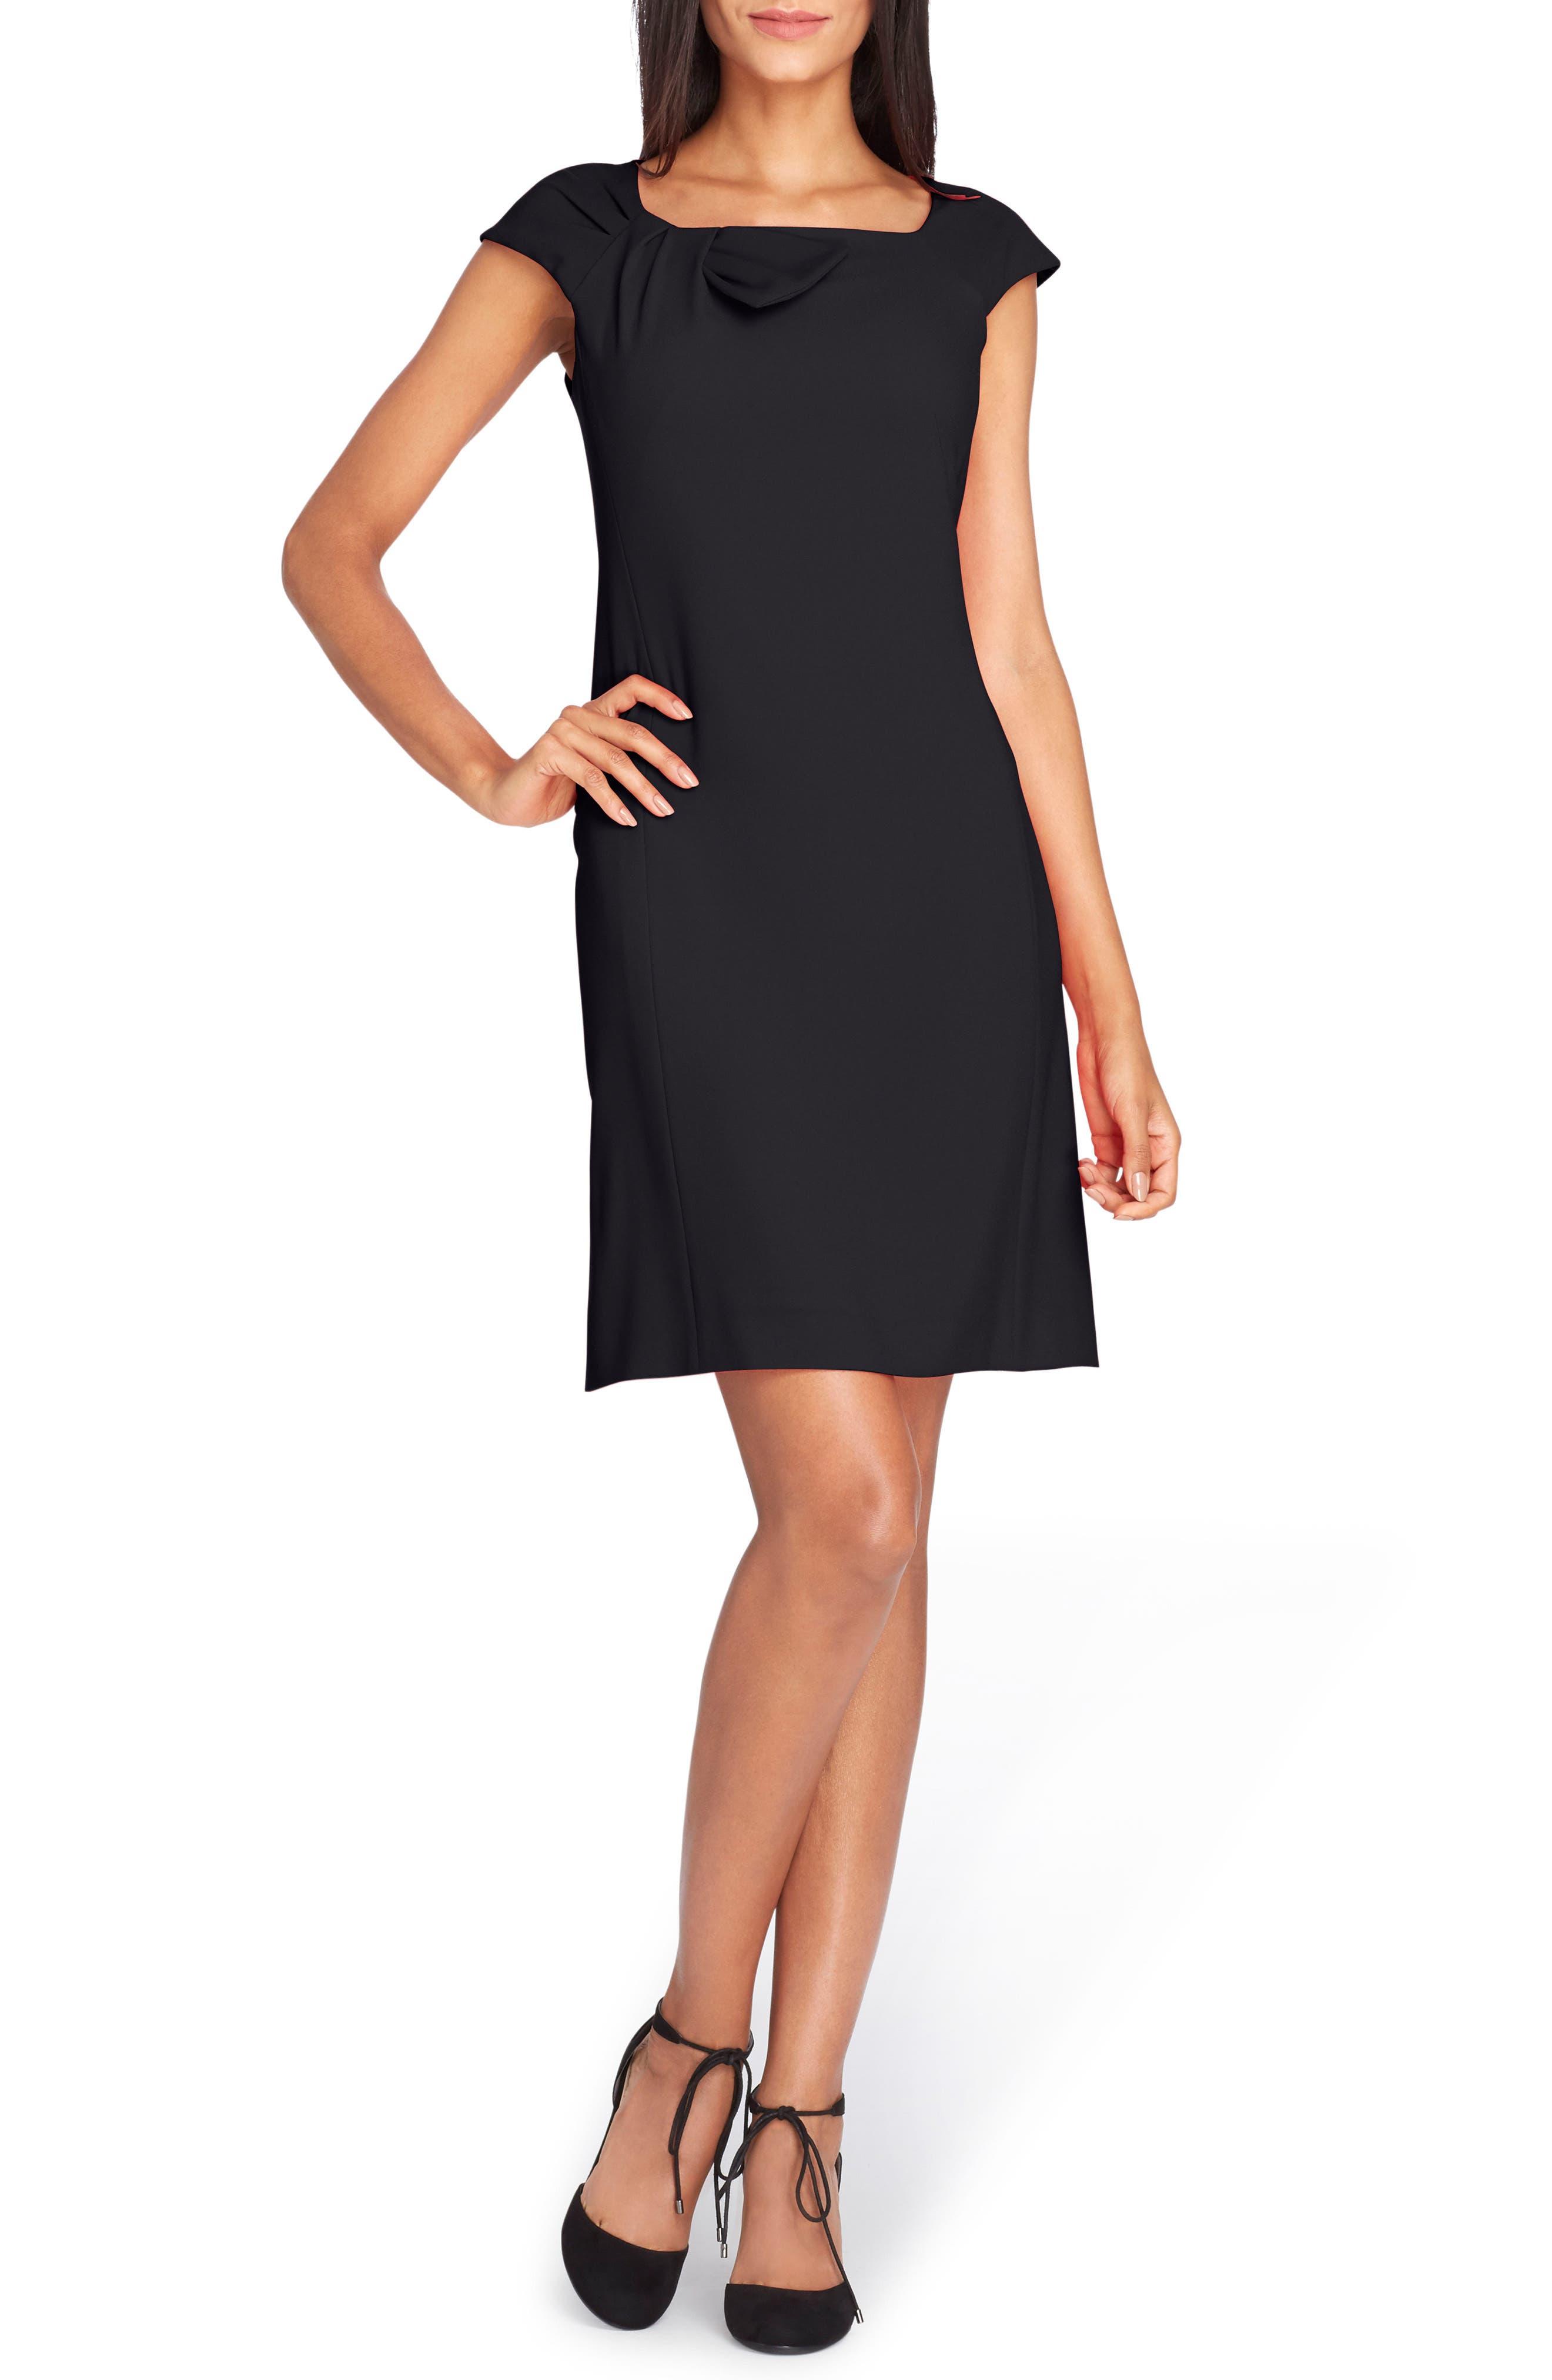 Alternate Image 1 Selected - Tahari Bow Neck Sheath Dress (Regular & Petite)